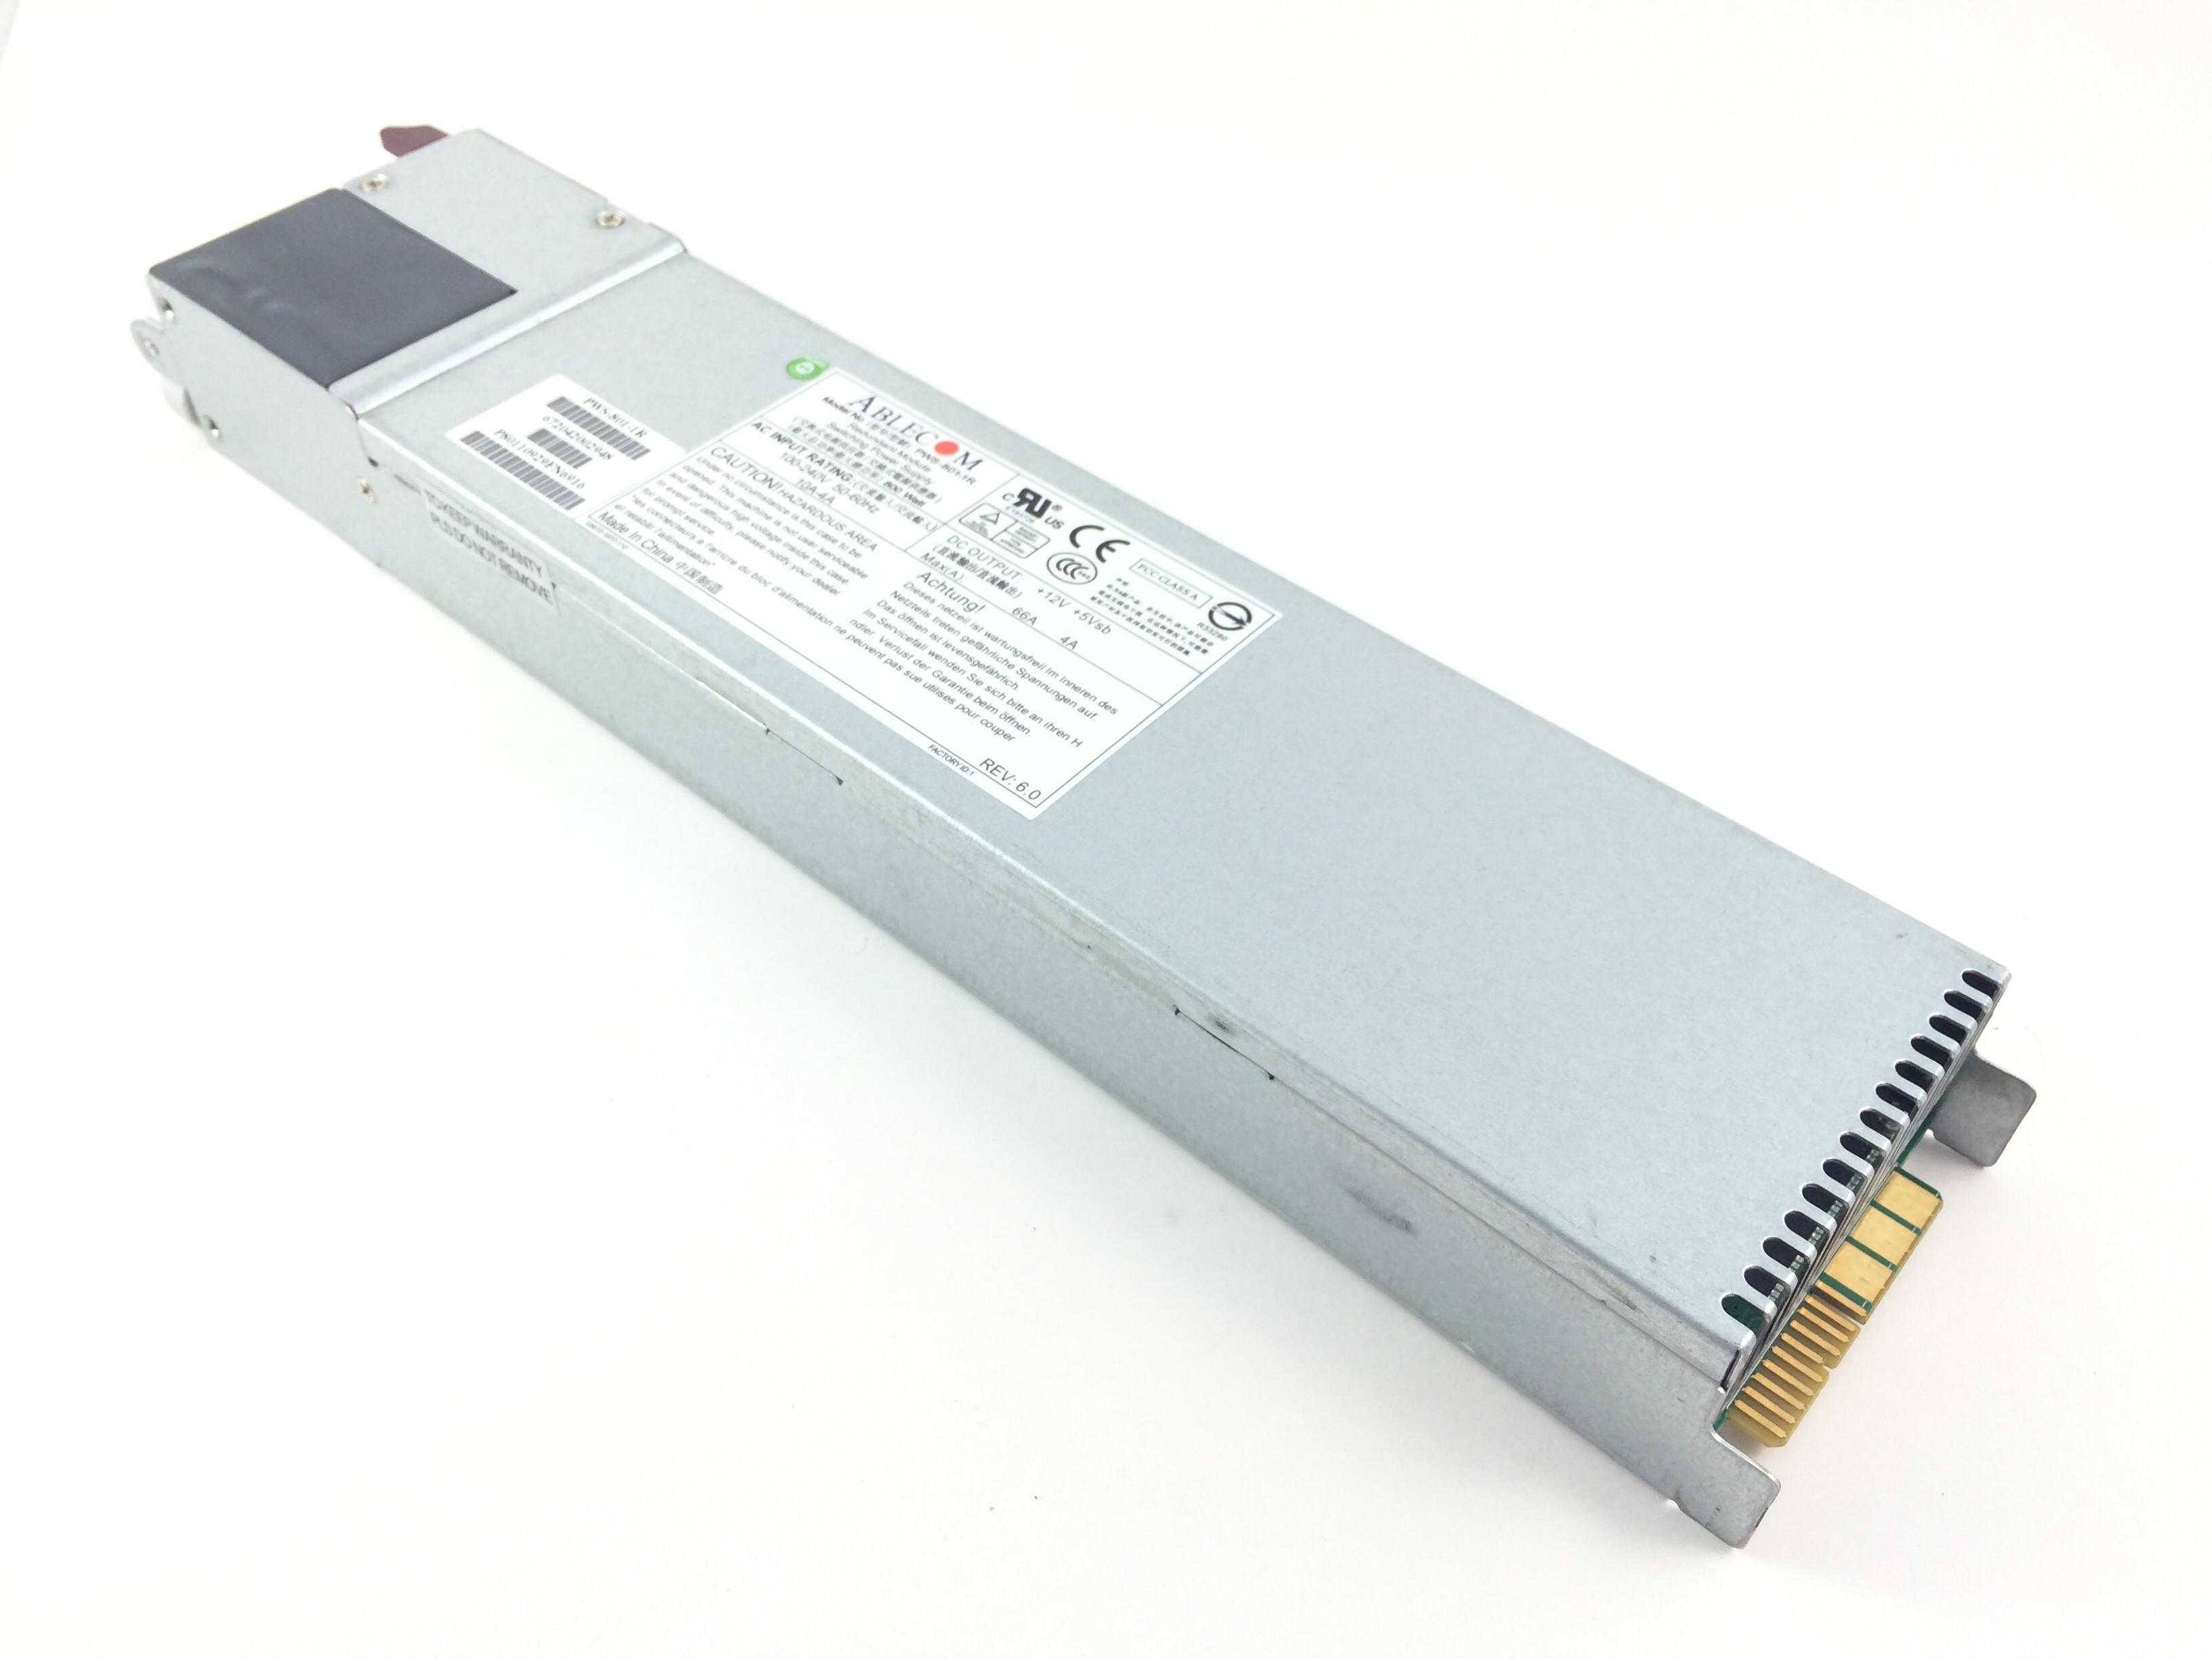 Supermicro 800W Hot Swap Power Supply (PWS-801-1R)